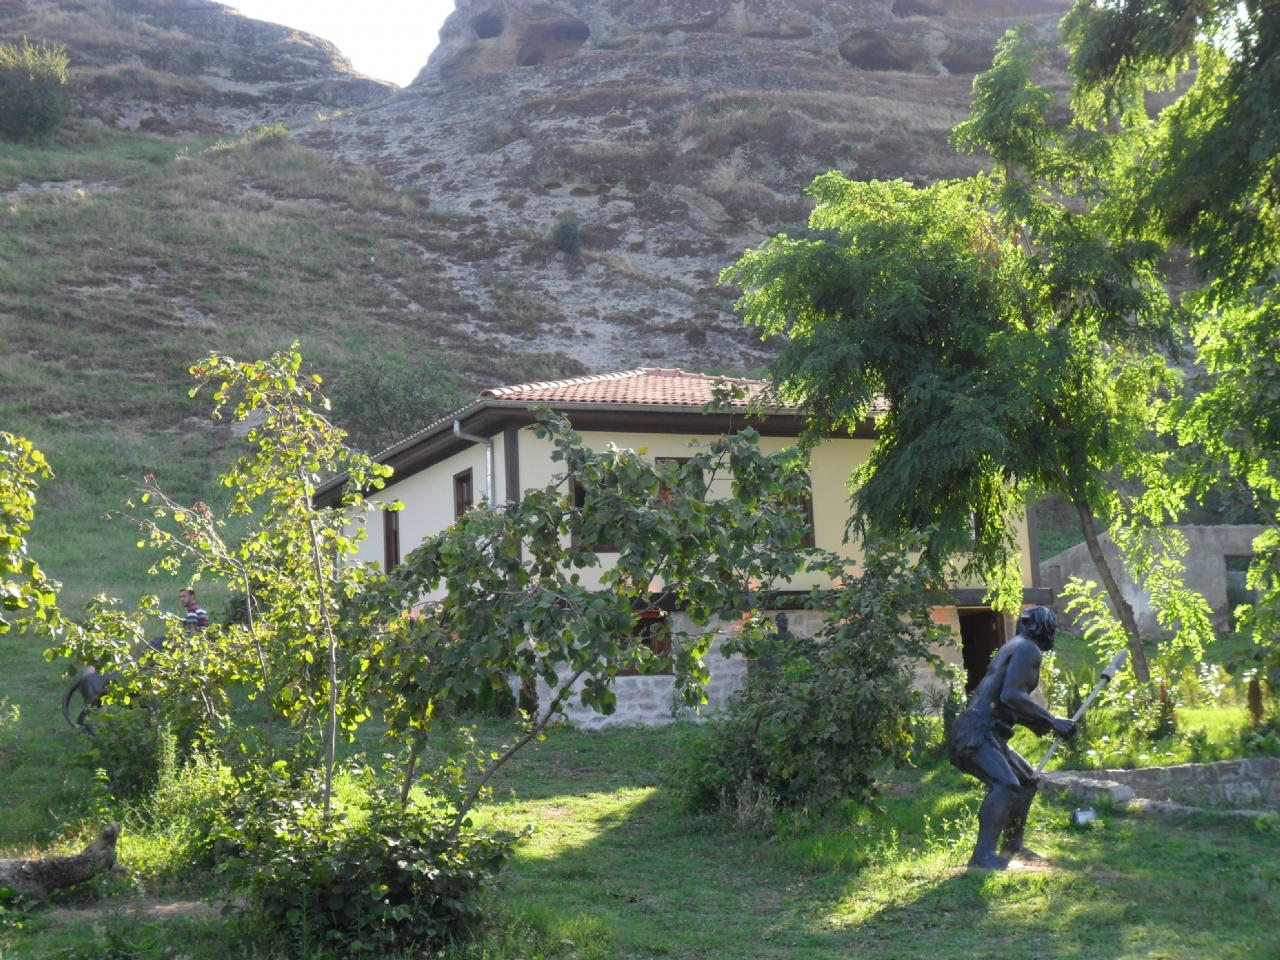 Arkeoloji Vadisi - Turizm Haritası